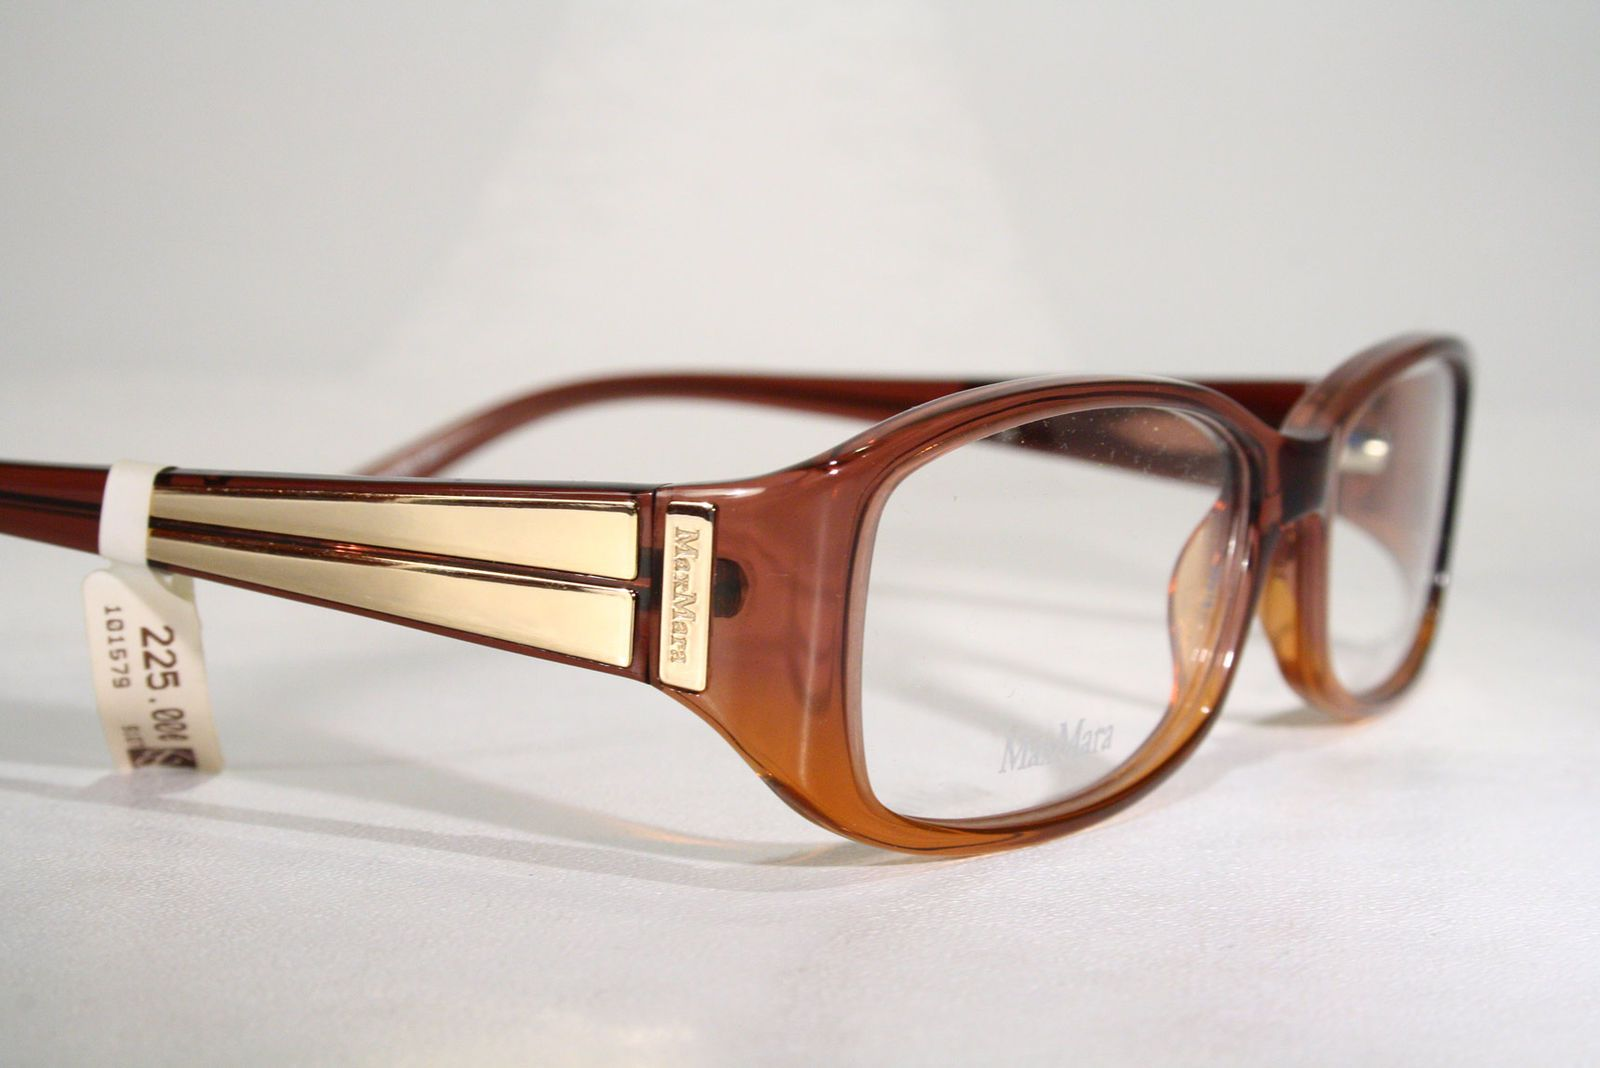 c4ff845d31a Details about Women s Gold Decor Brown Plastic MAX MARA Seethru ...